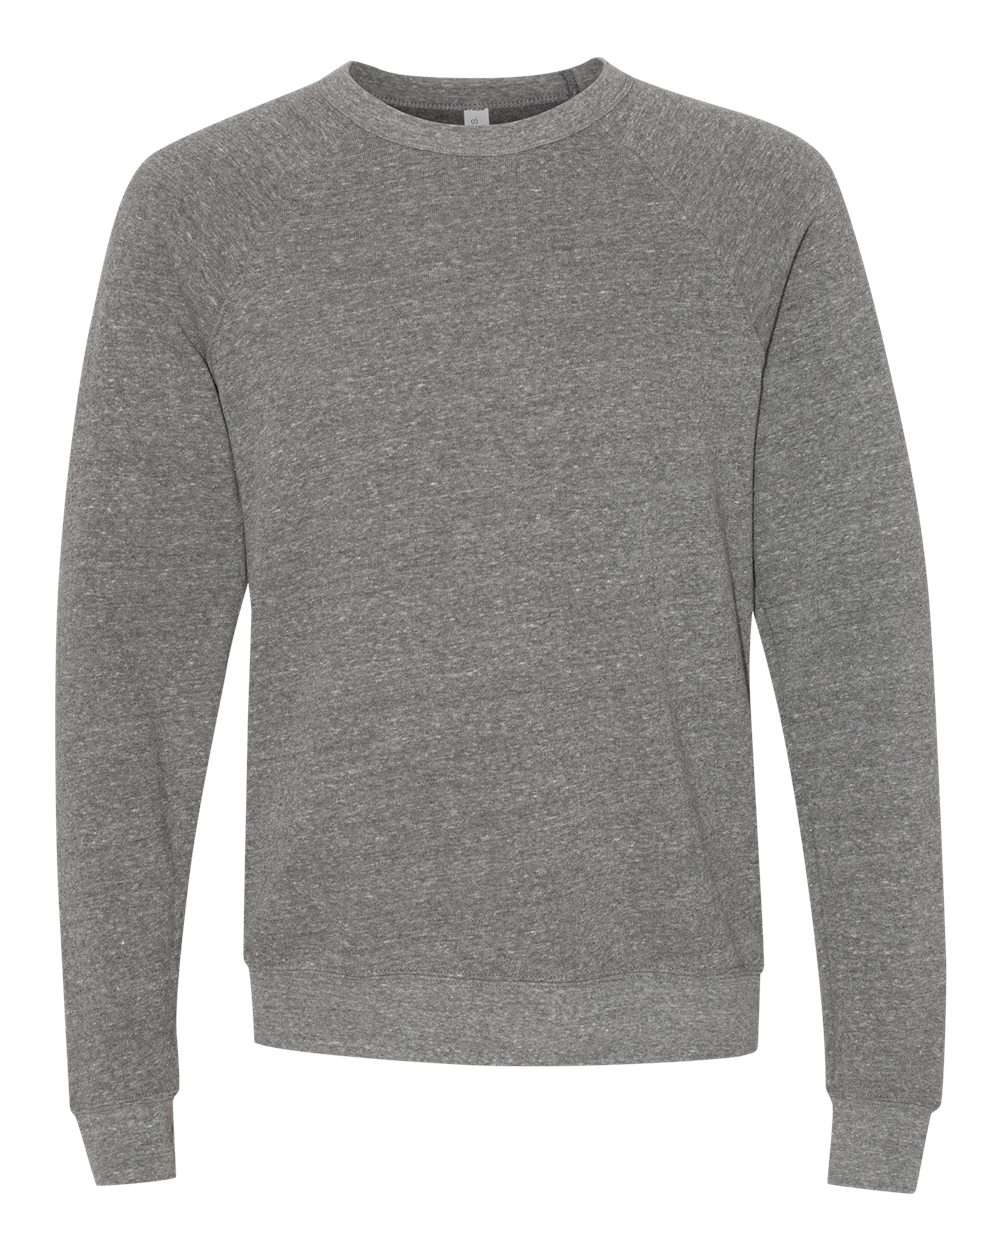 Bella-Canvas-Unisex-Sponge-Fleece-Crewneck-Sweatshirt-Top-Blank-3901-up-to-2XL thumbnail 24